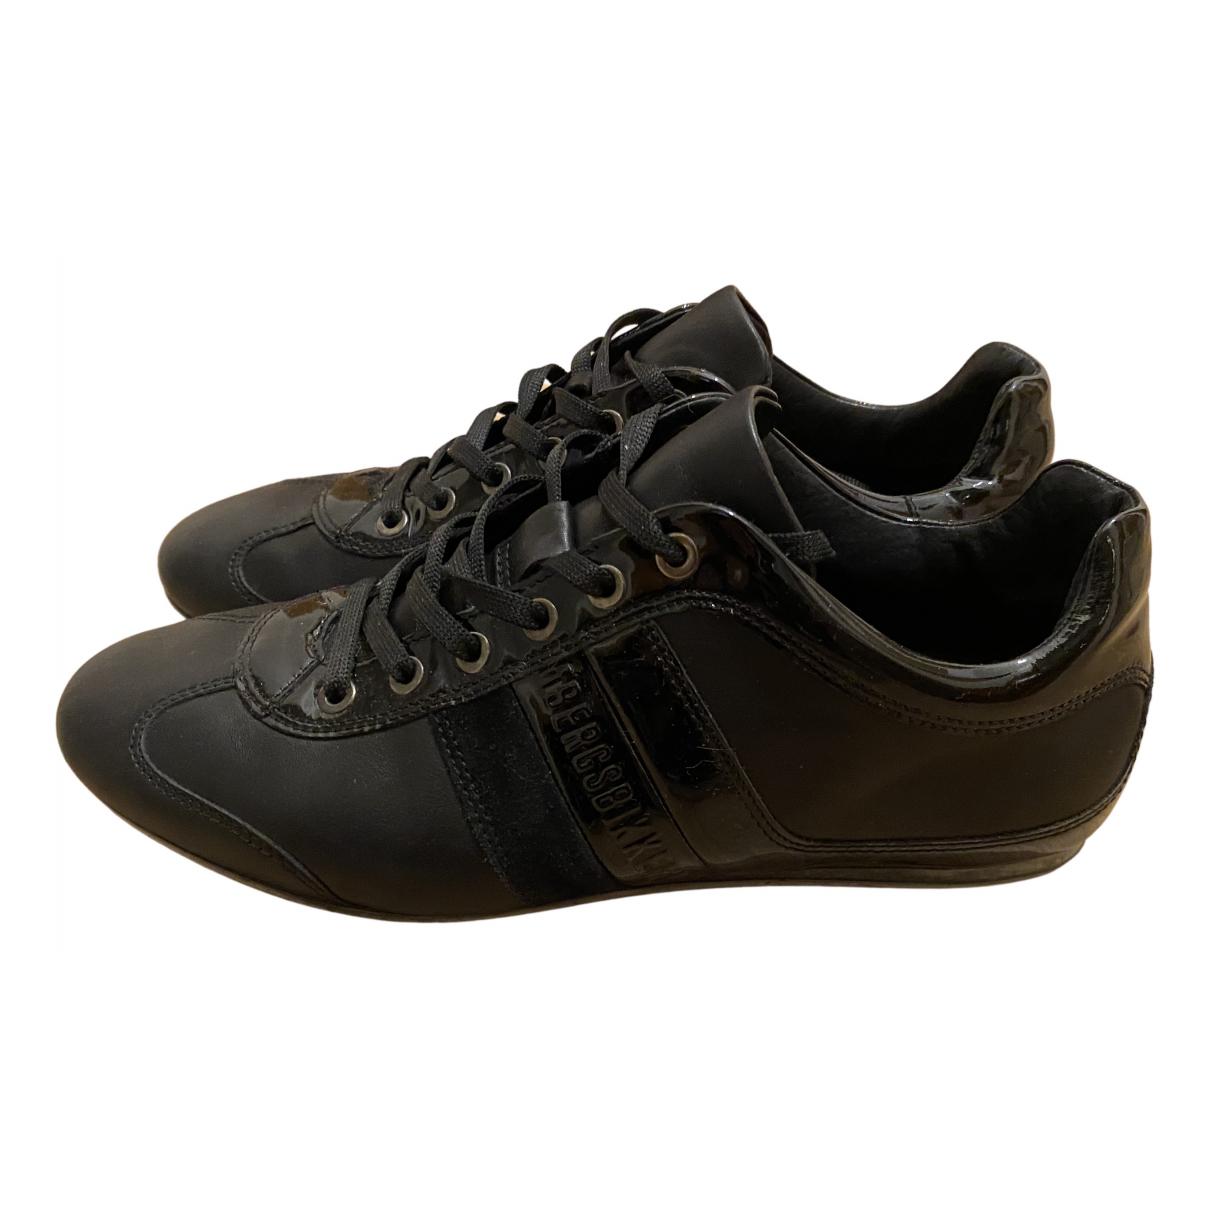 Dirk Bikkembergs - Baskets   pour homme en cuir - noir